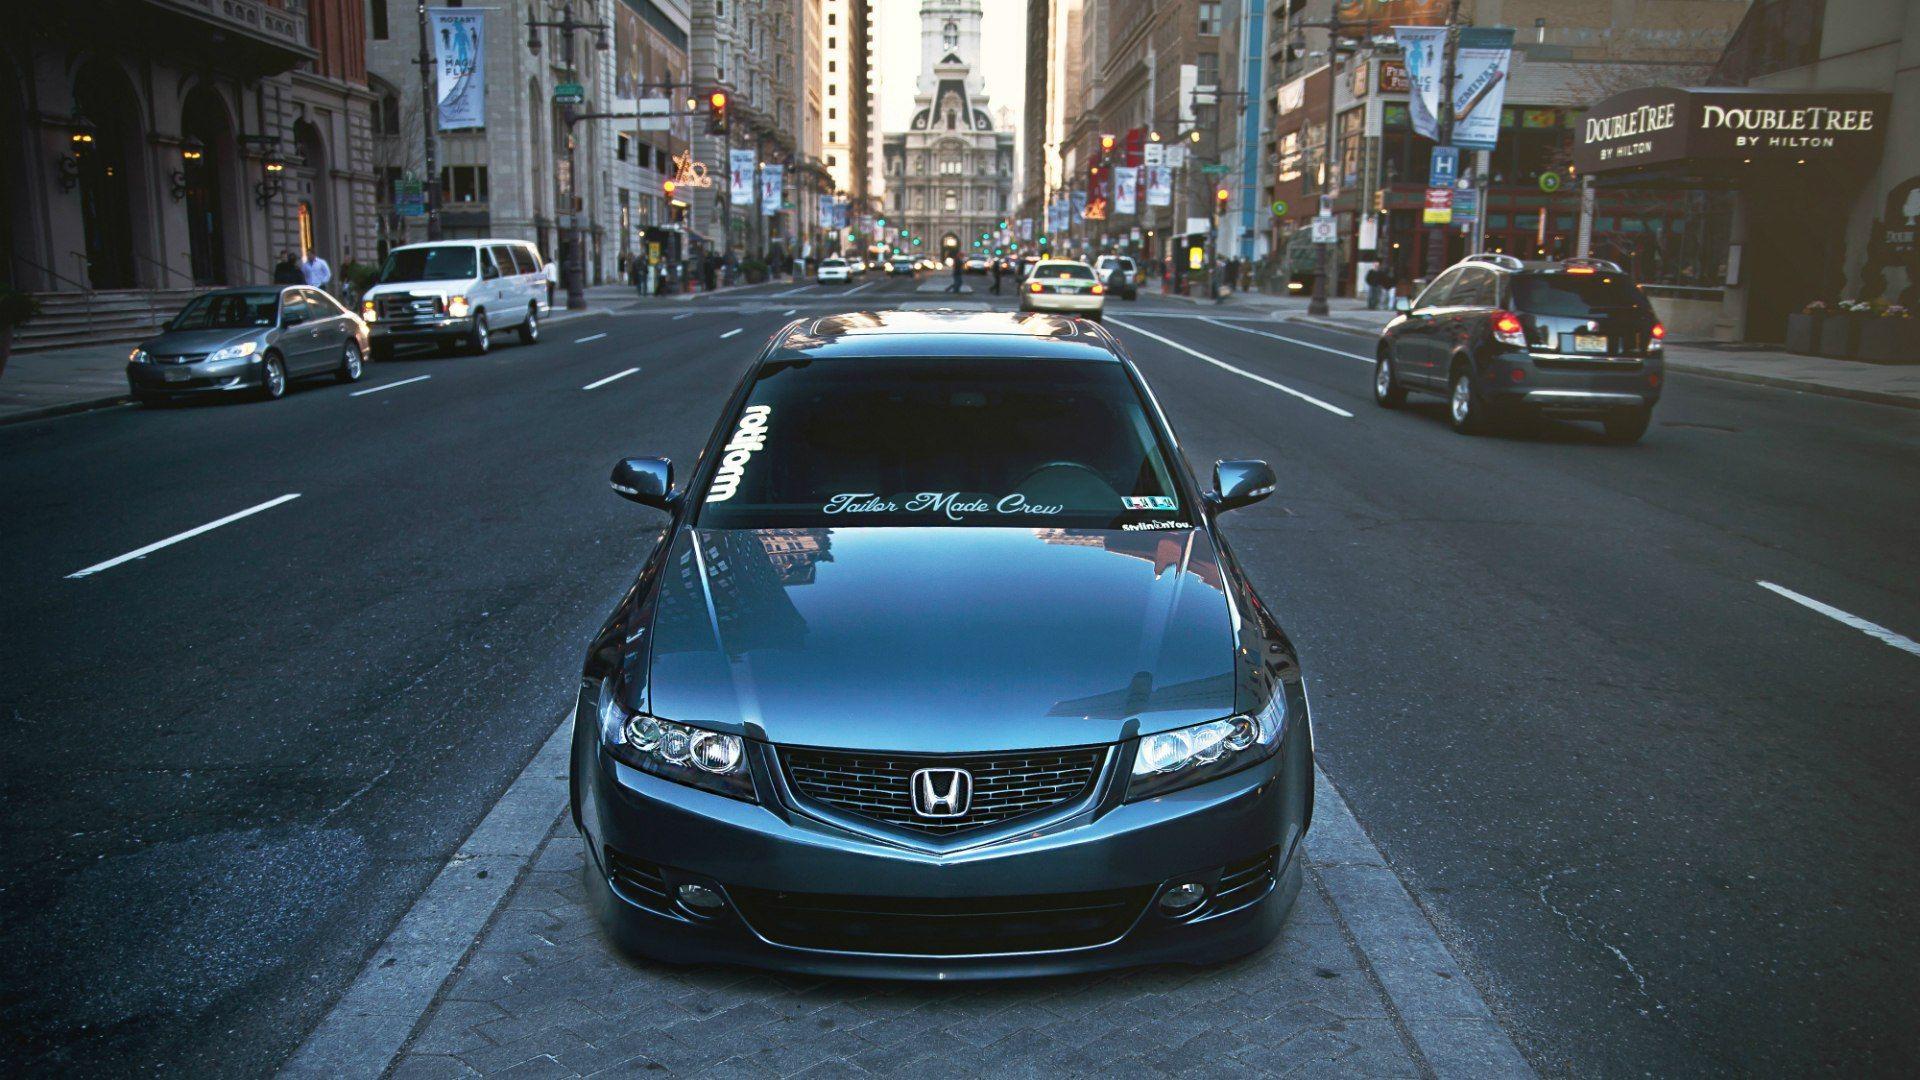 Honda Accord free picture